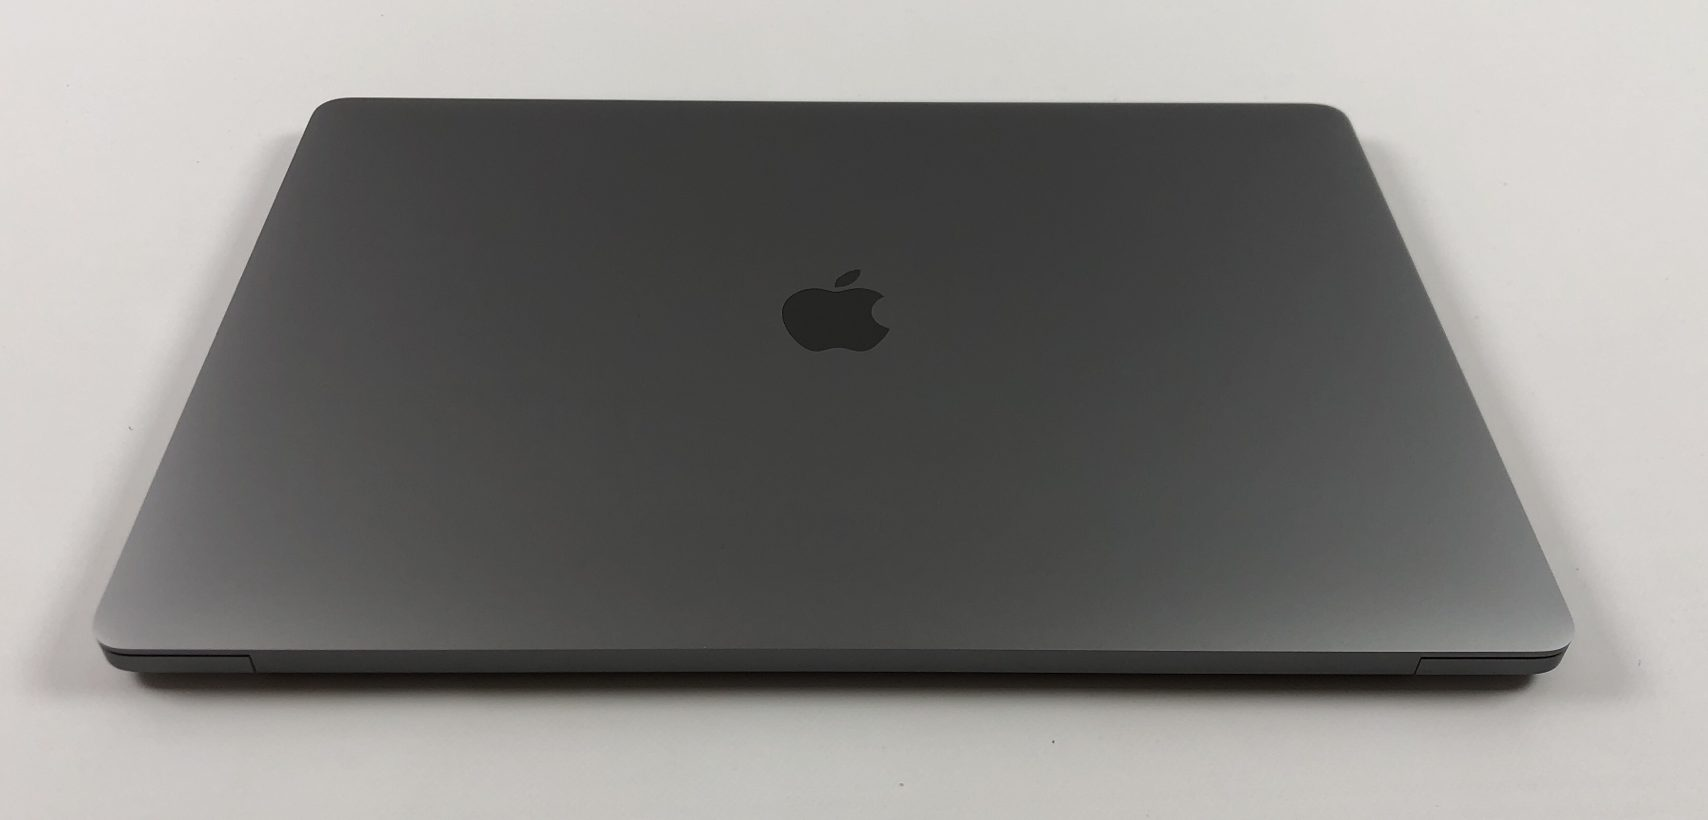 "MacBook Pro 16"" Touch Bar Late 2019 (Intel 8-Core i9 2.3 GHz 32 GB RAM 1 TB SSD), Space Gray, Intel 8-Core i9 2.3 GHz, 32 GB RAM, 1 TB SSD, Kuva 2"